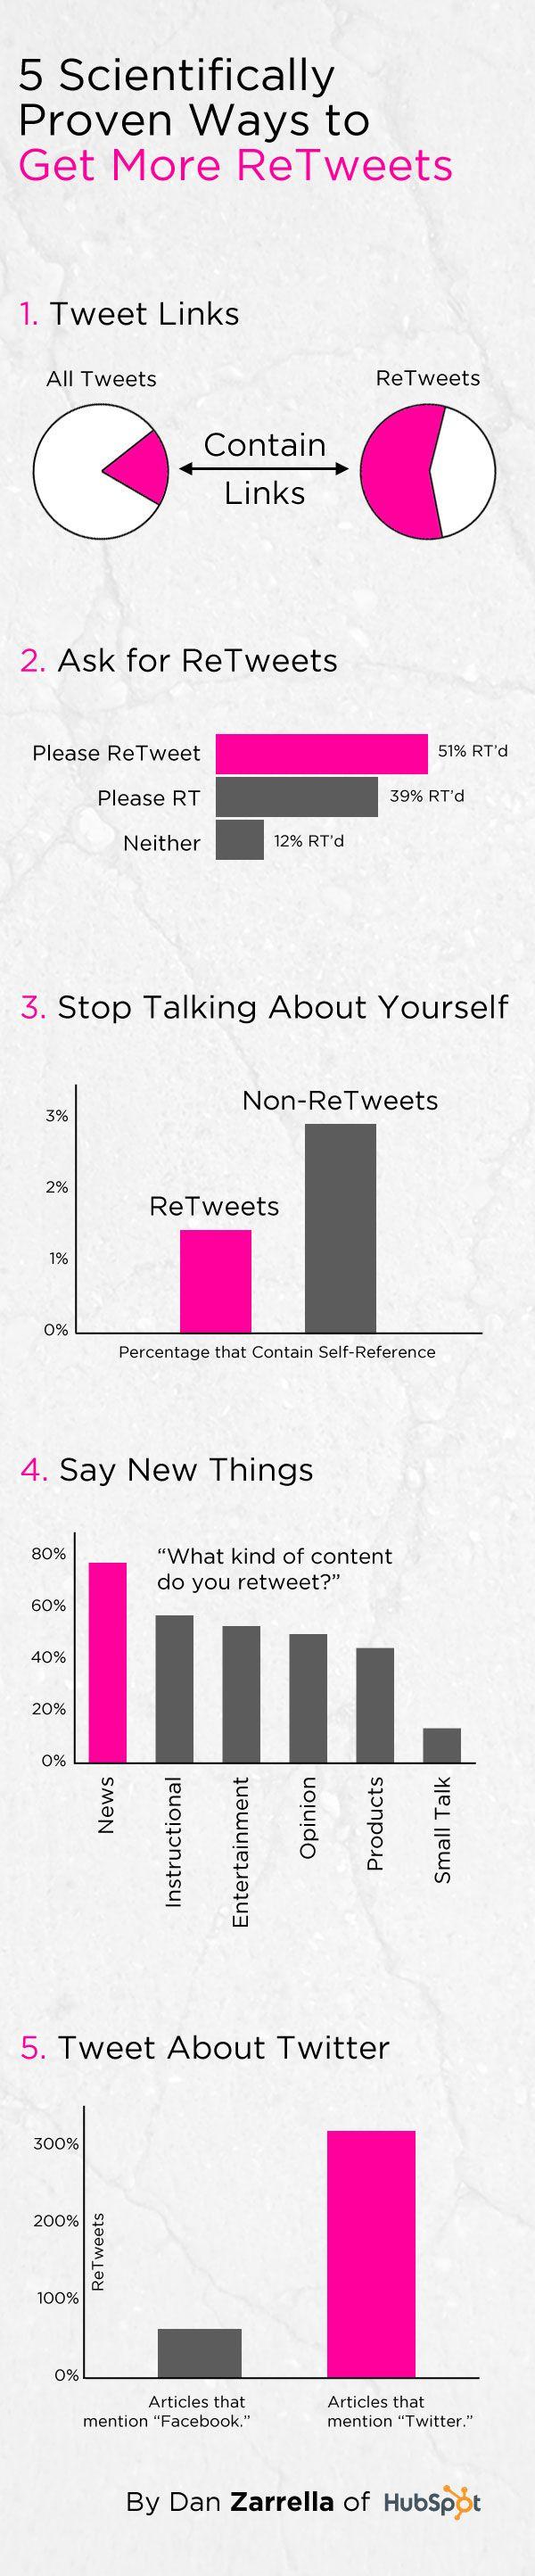 5 Scientifically Proven Ways to Get More ReTweets